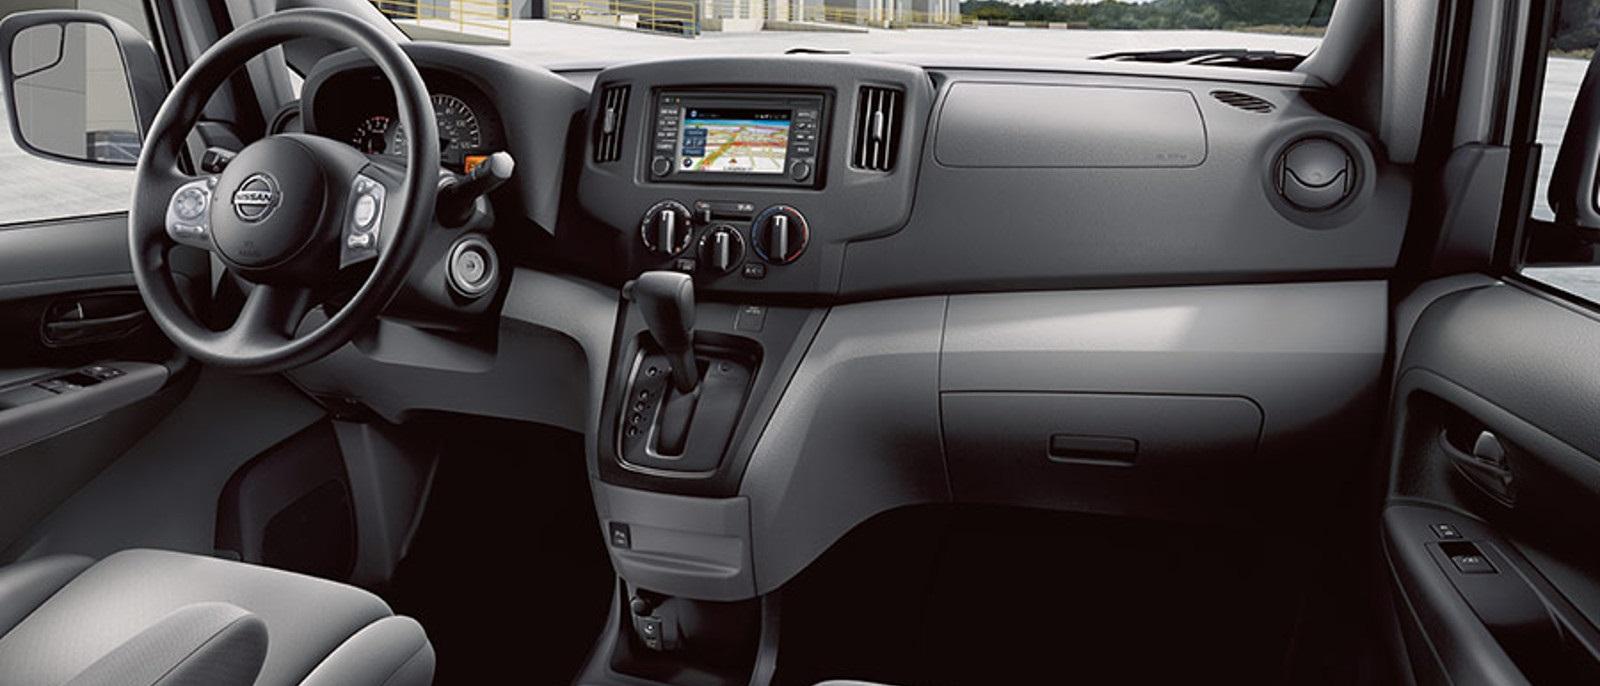 Nissan Of Gastonia >> 2015 Nissan NV200 Gastonia Charlotte | Gastonia Nissan